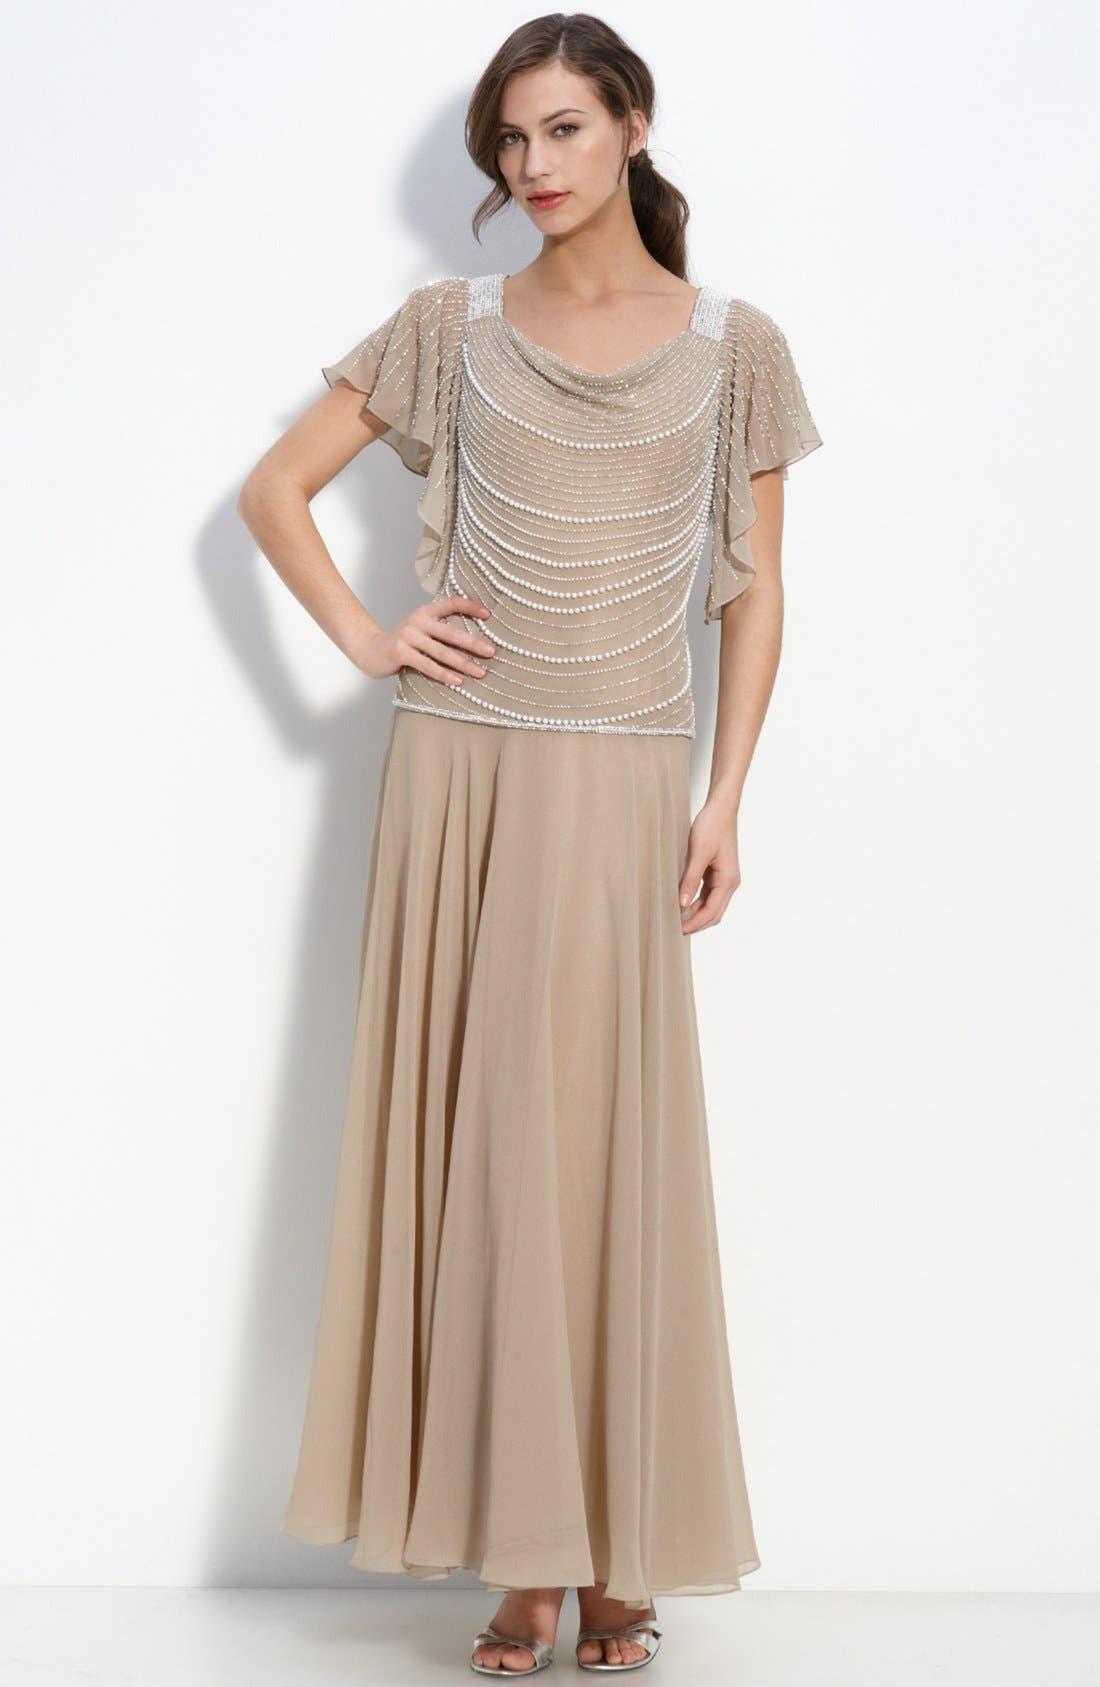 Main Image - J Kara Beaded Mock Two-Piece Crepe Dress